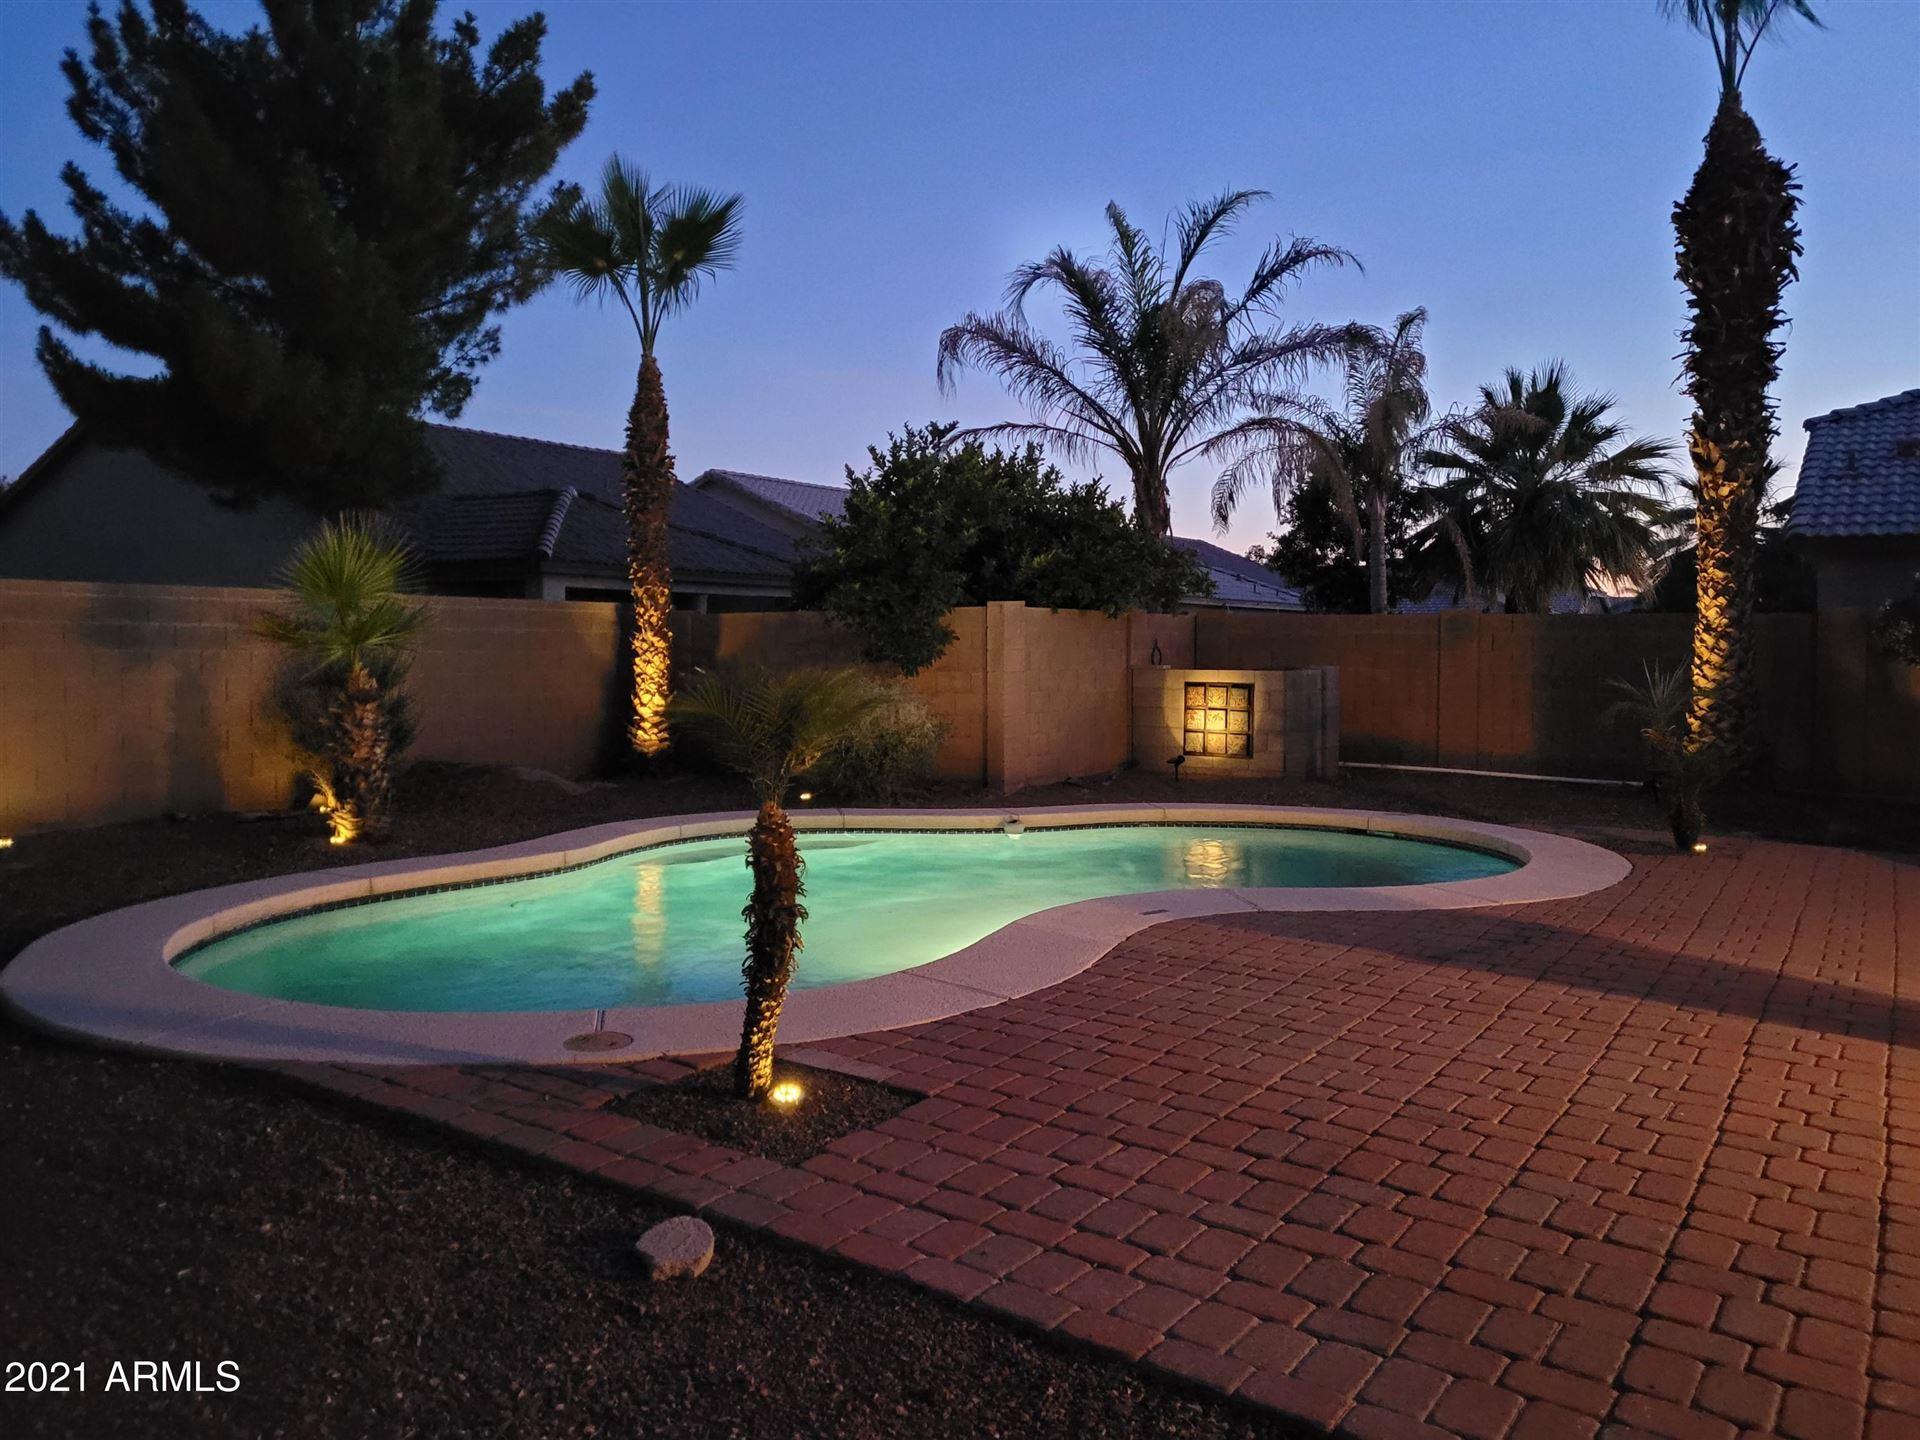 Photo of 10505 W EDGEMONT Drive, Avondale, AZ 85392 (MLS # 6246606)